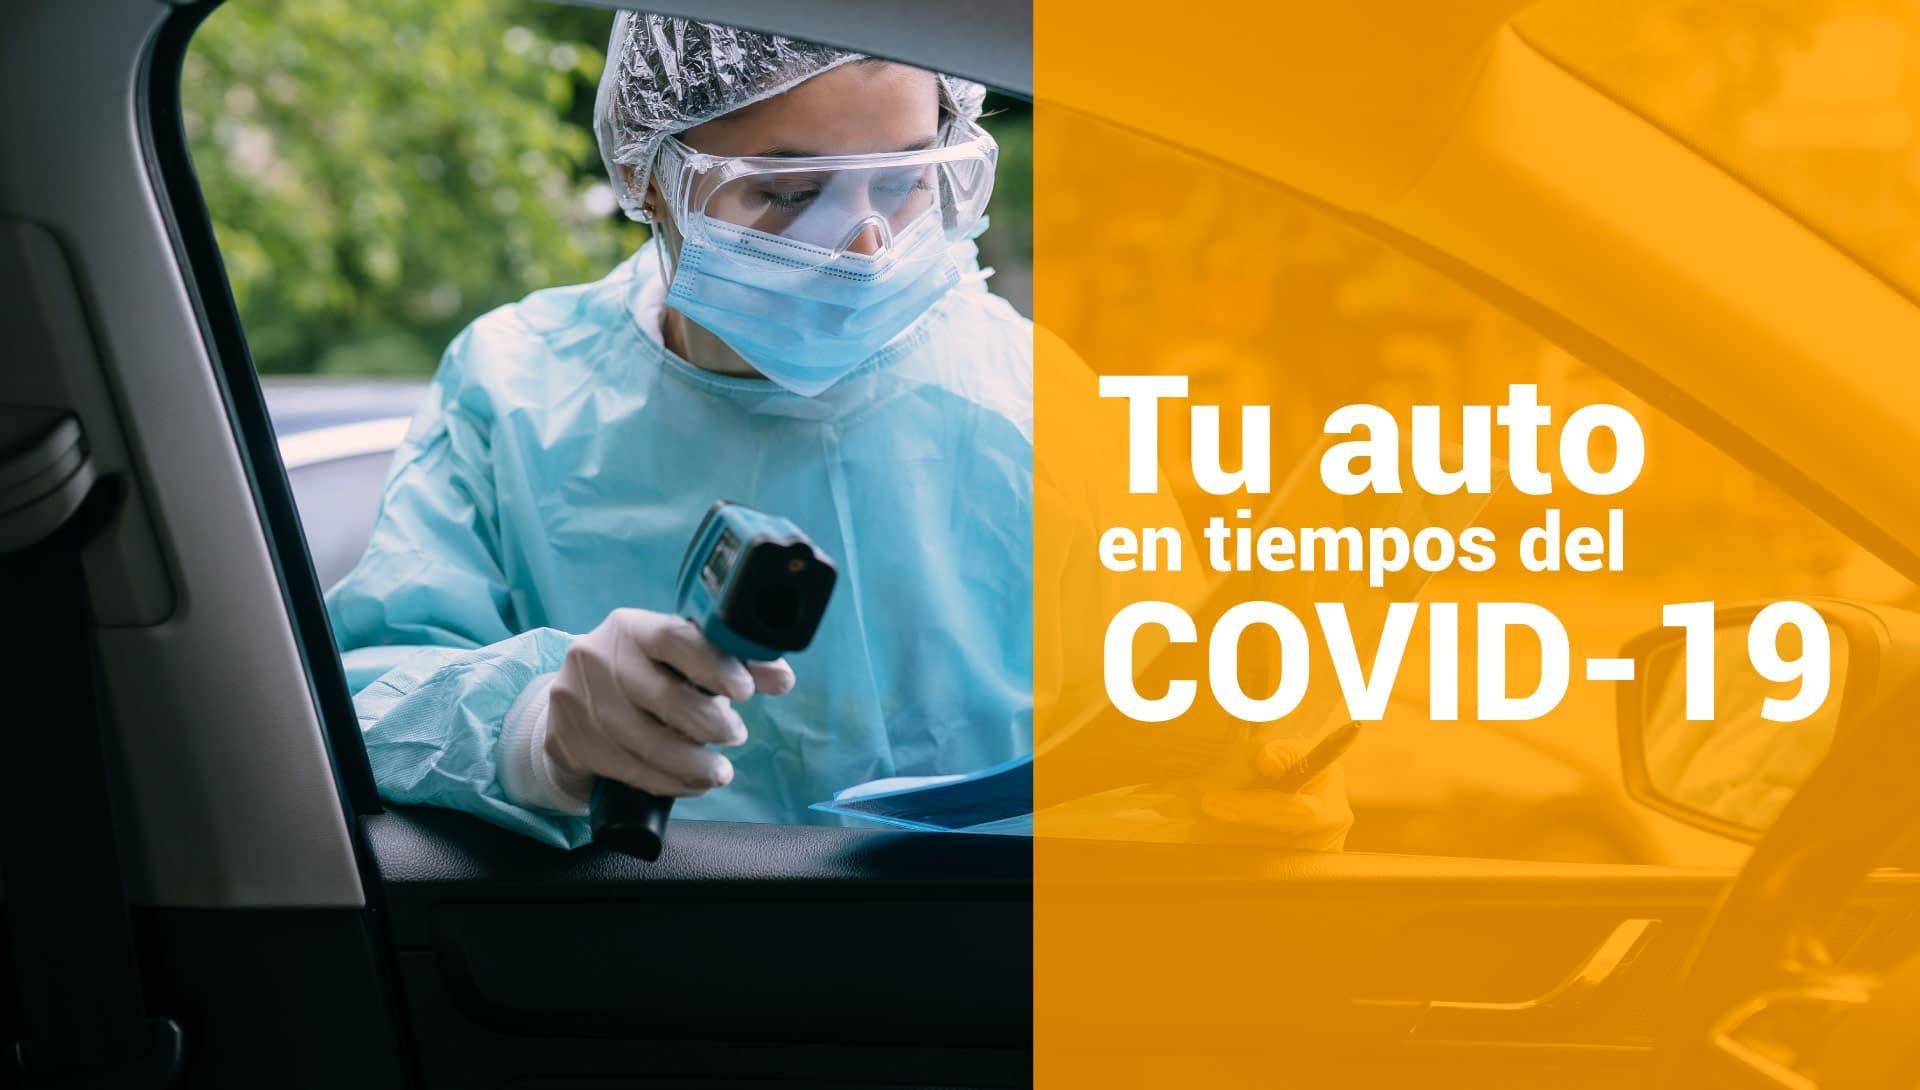 Desinfecta tu auto